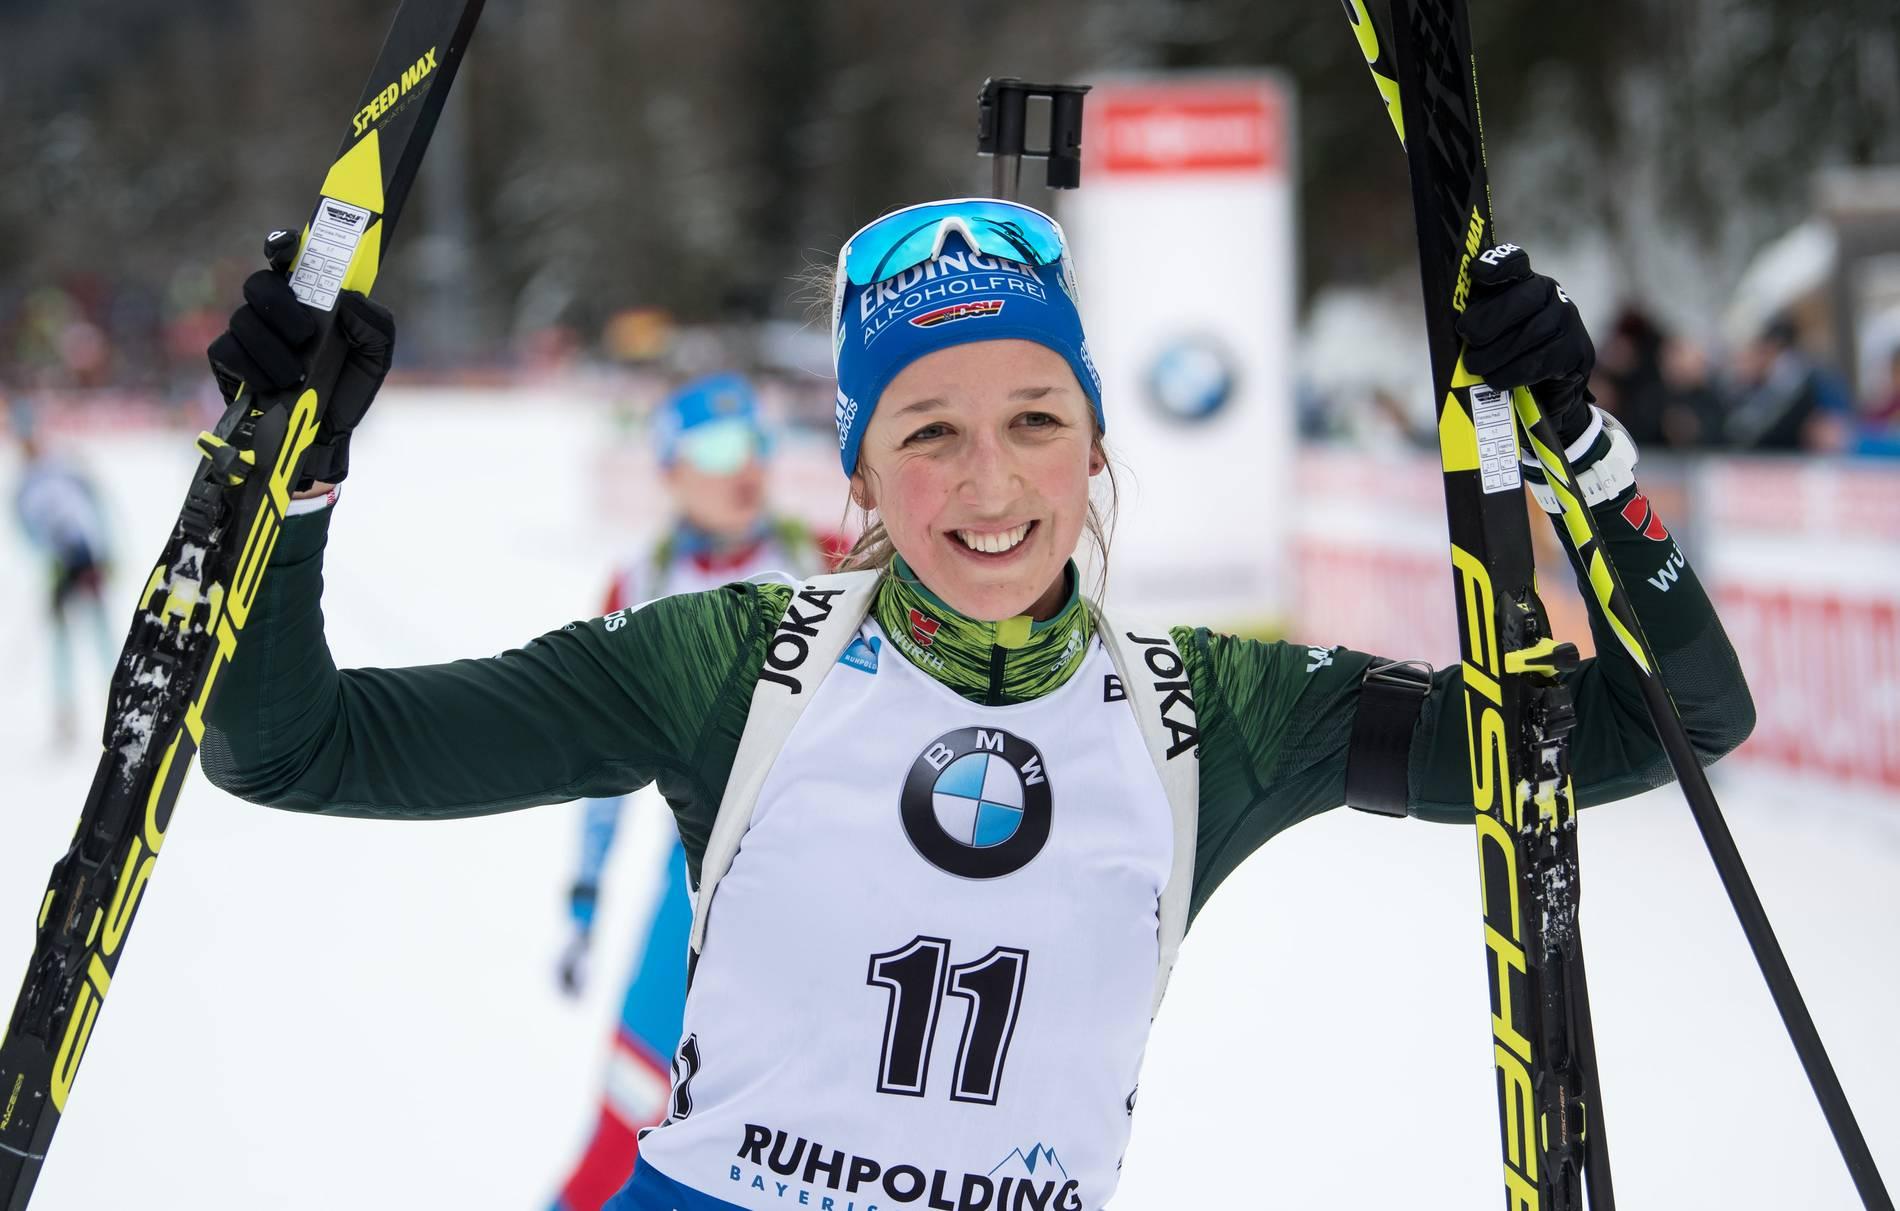 Biathlon Franziska Preuß